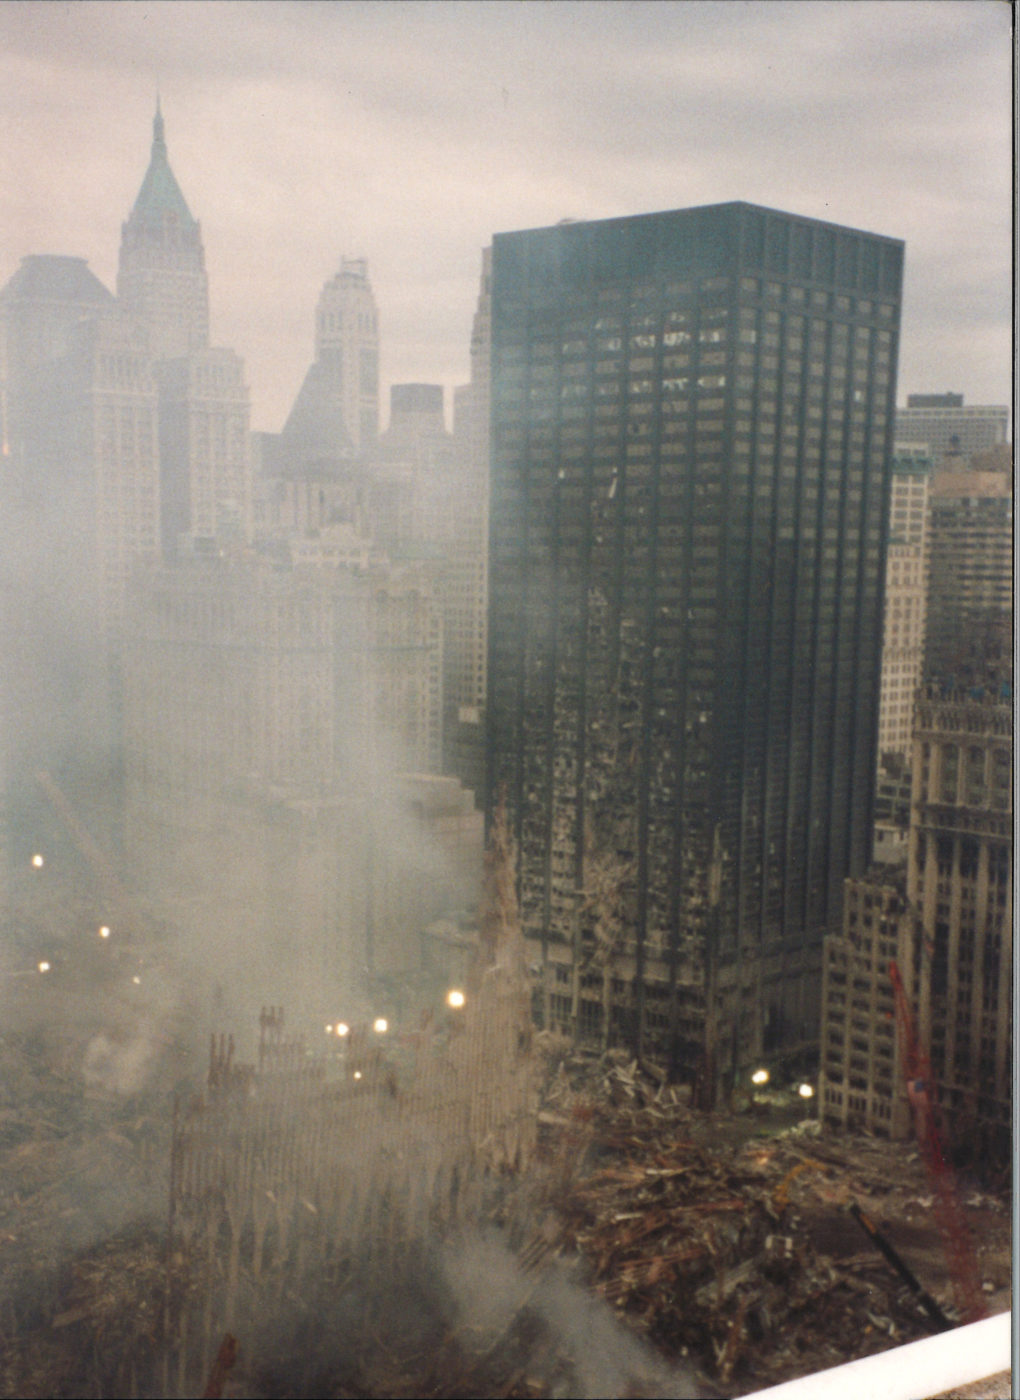 Smoke rising through the WTC Exoskeleton wirh blown out windows on the Deutsche Bank building